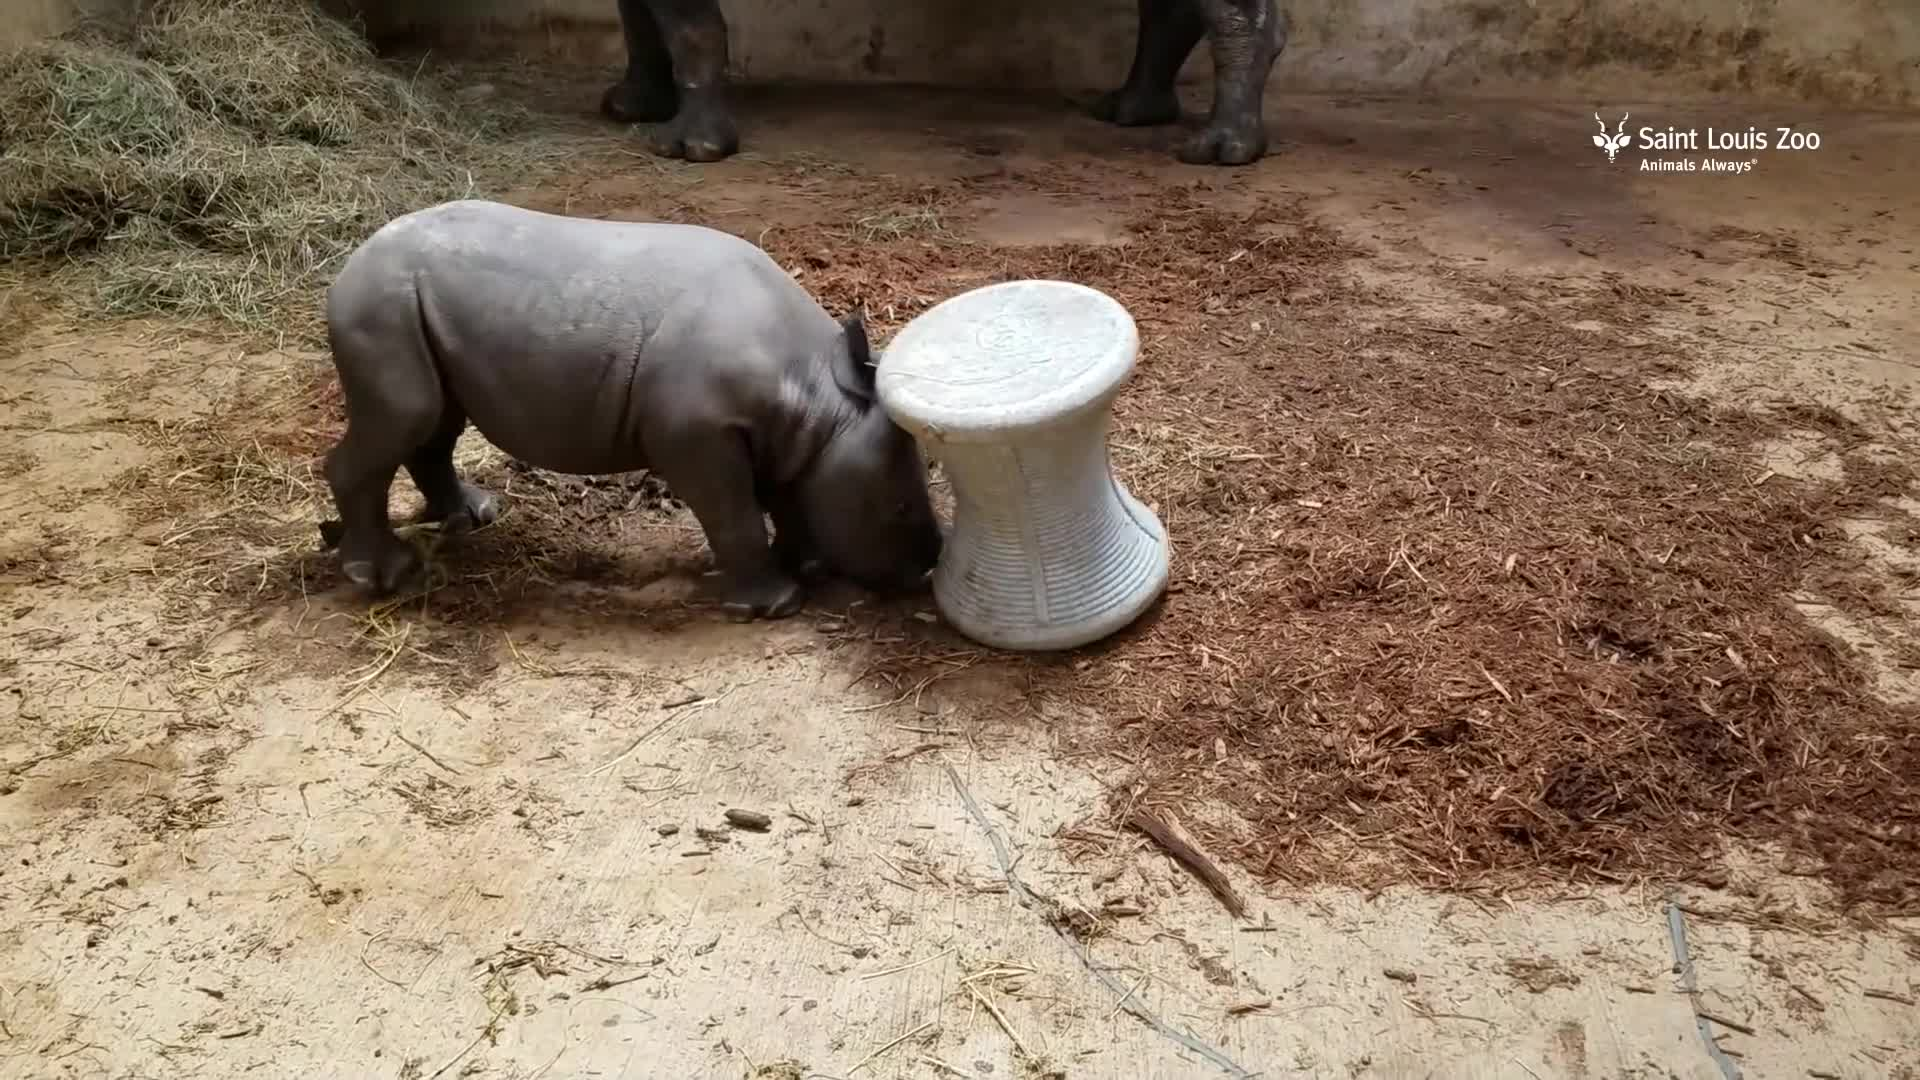 Saint Louis Zoo, baby animals, endangered, rhino, Black rhino calf Moyo plays at Saint Louis Zoo GIFs